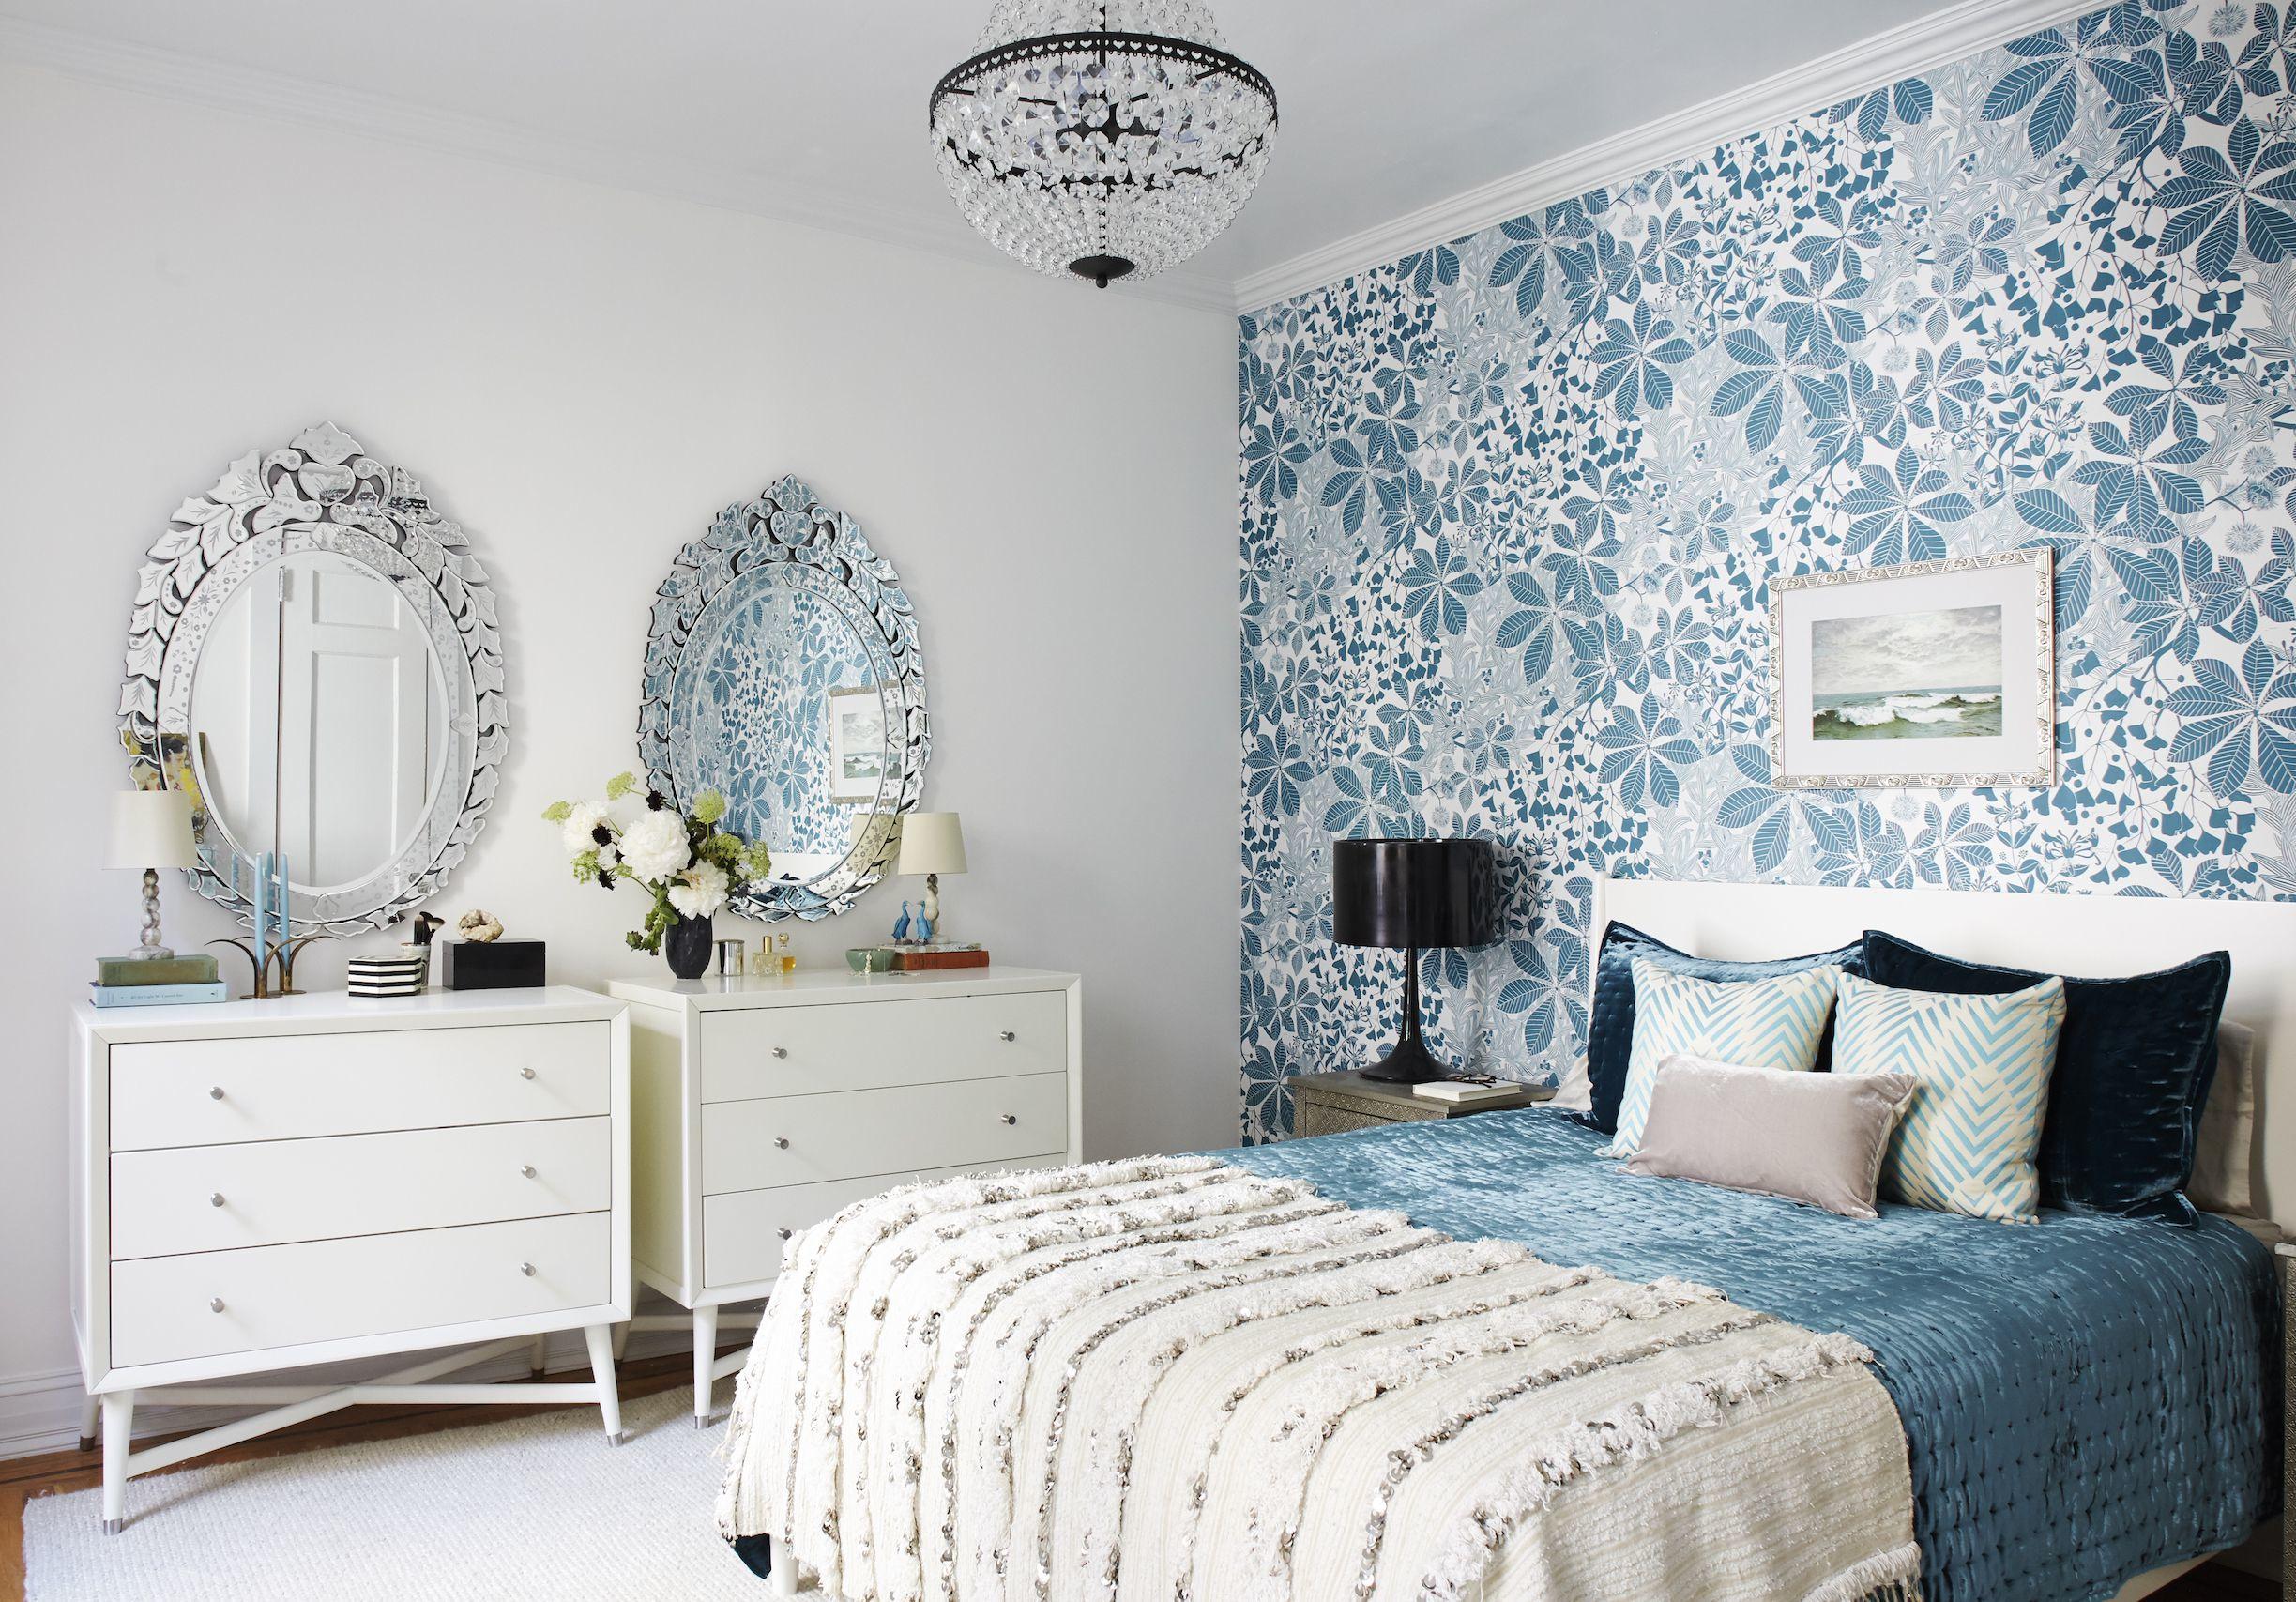 Master Bedroom Interior Design Images Master Bedroom Design Images Bedroom Furniture And Decorating Ideas